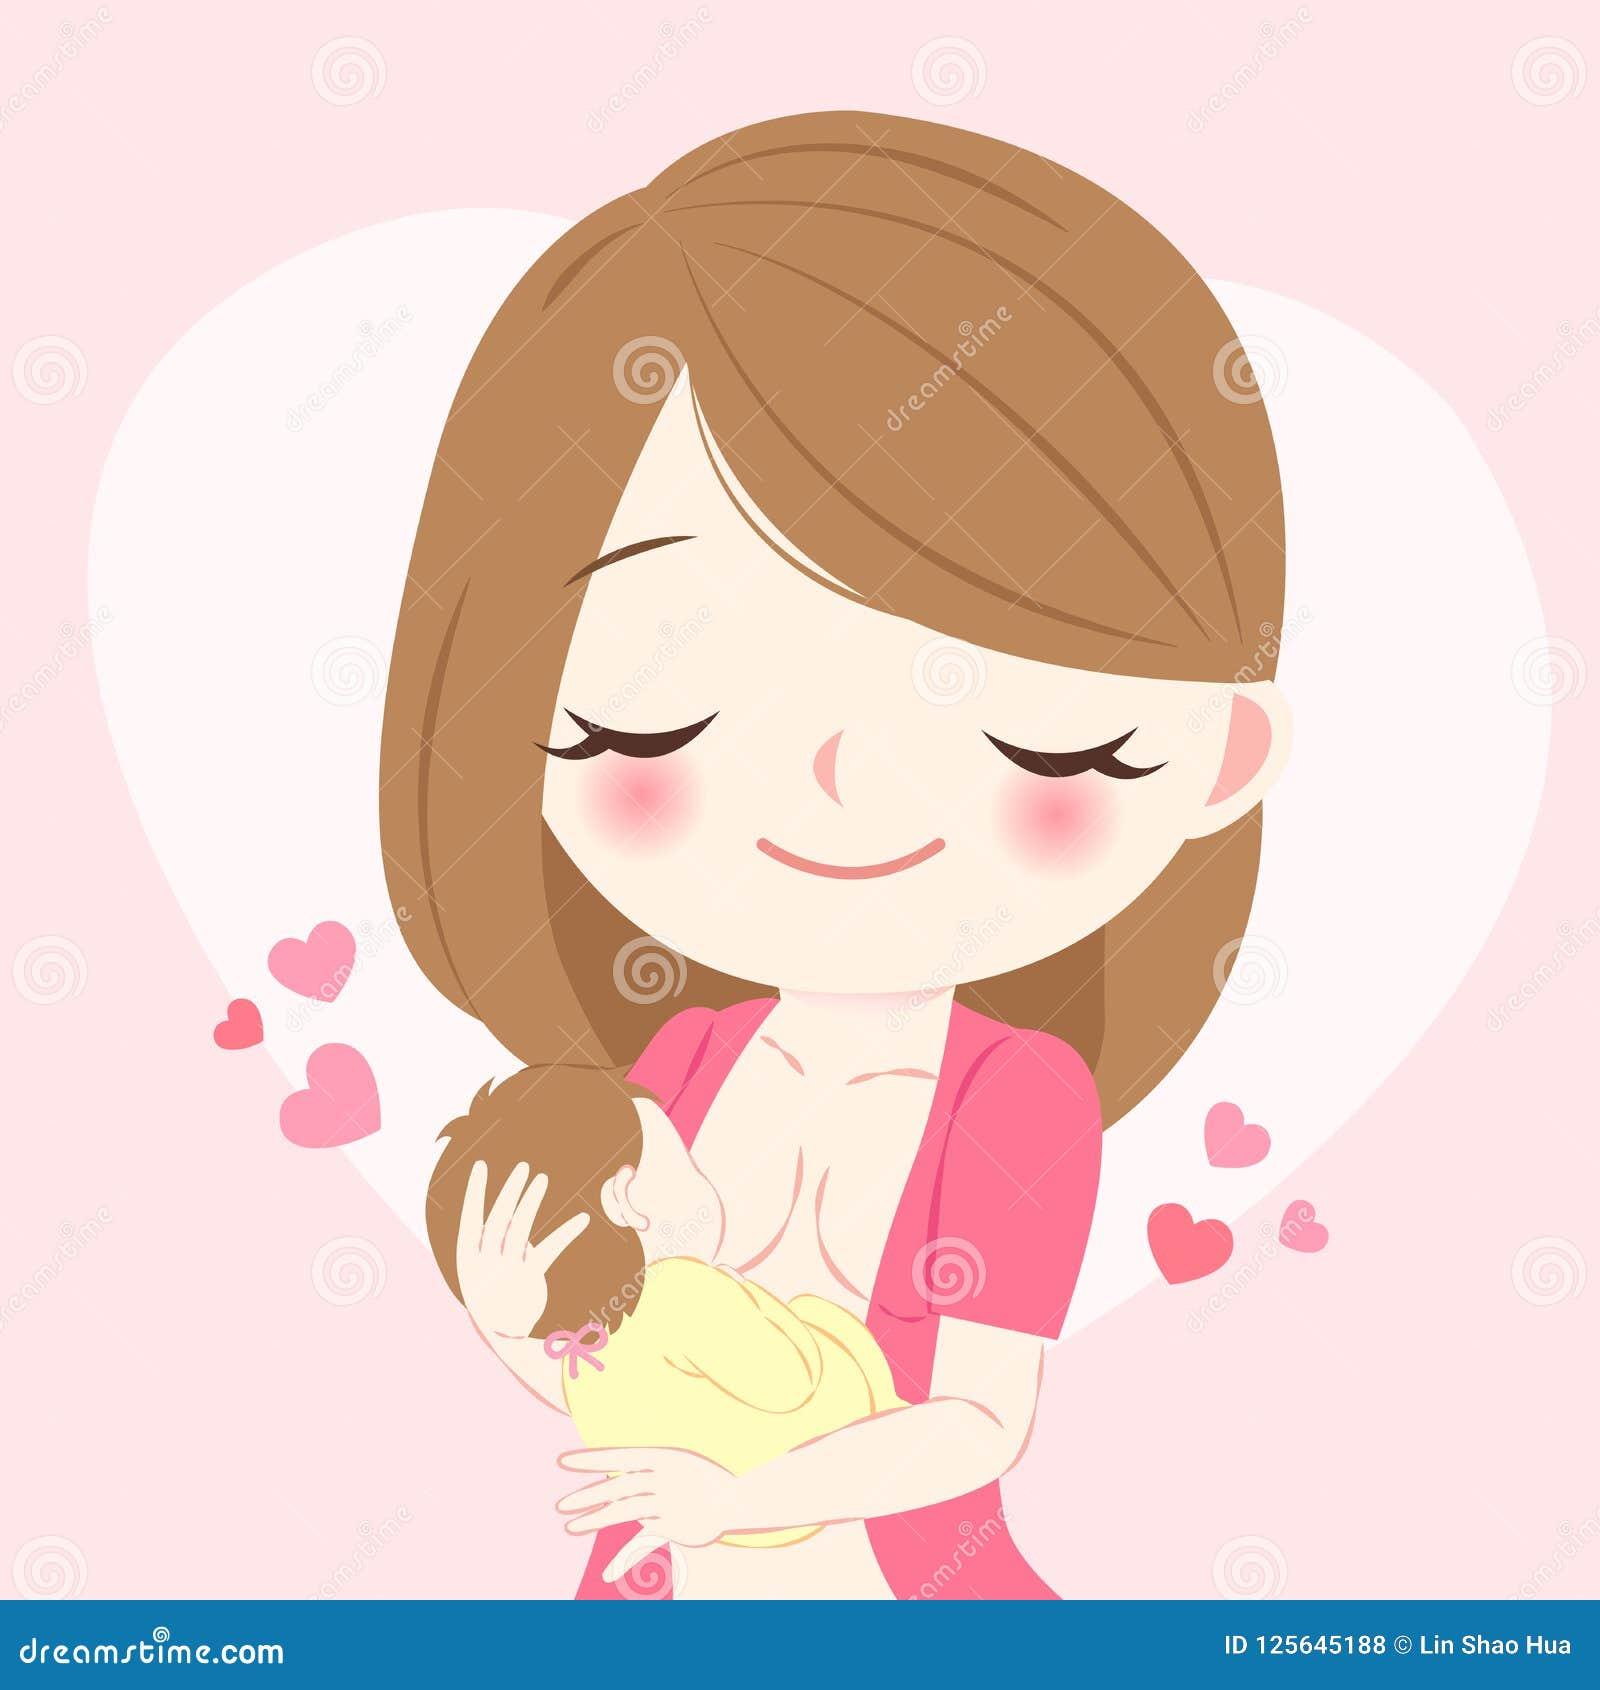 Woman with breast feeding